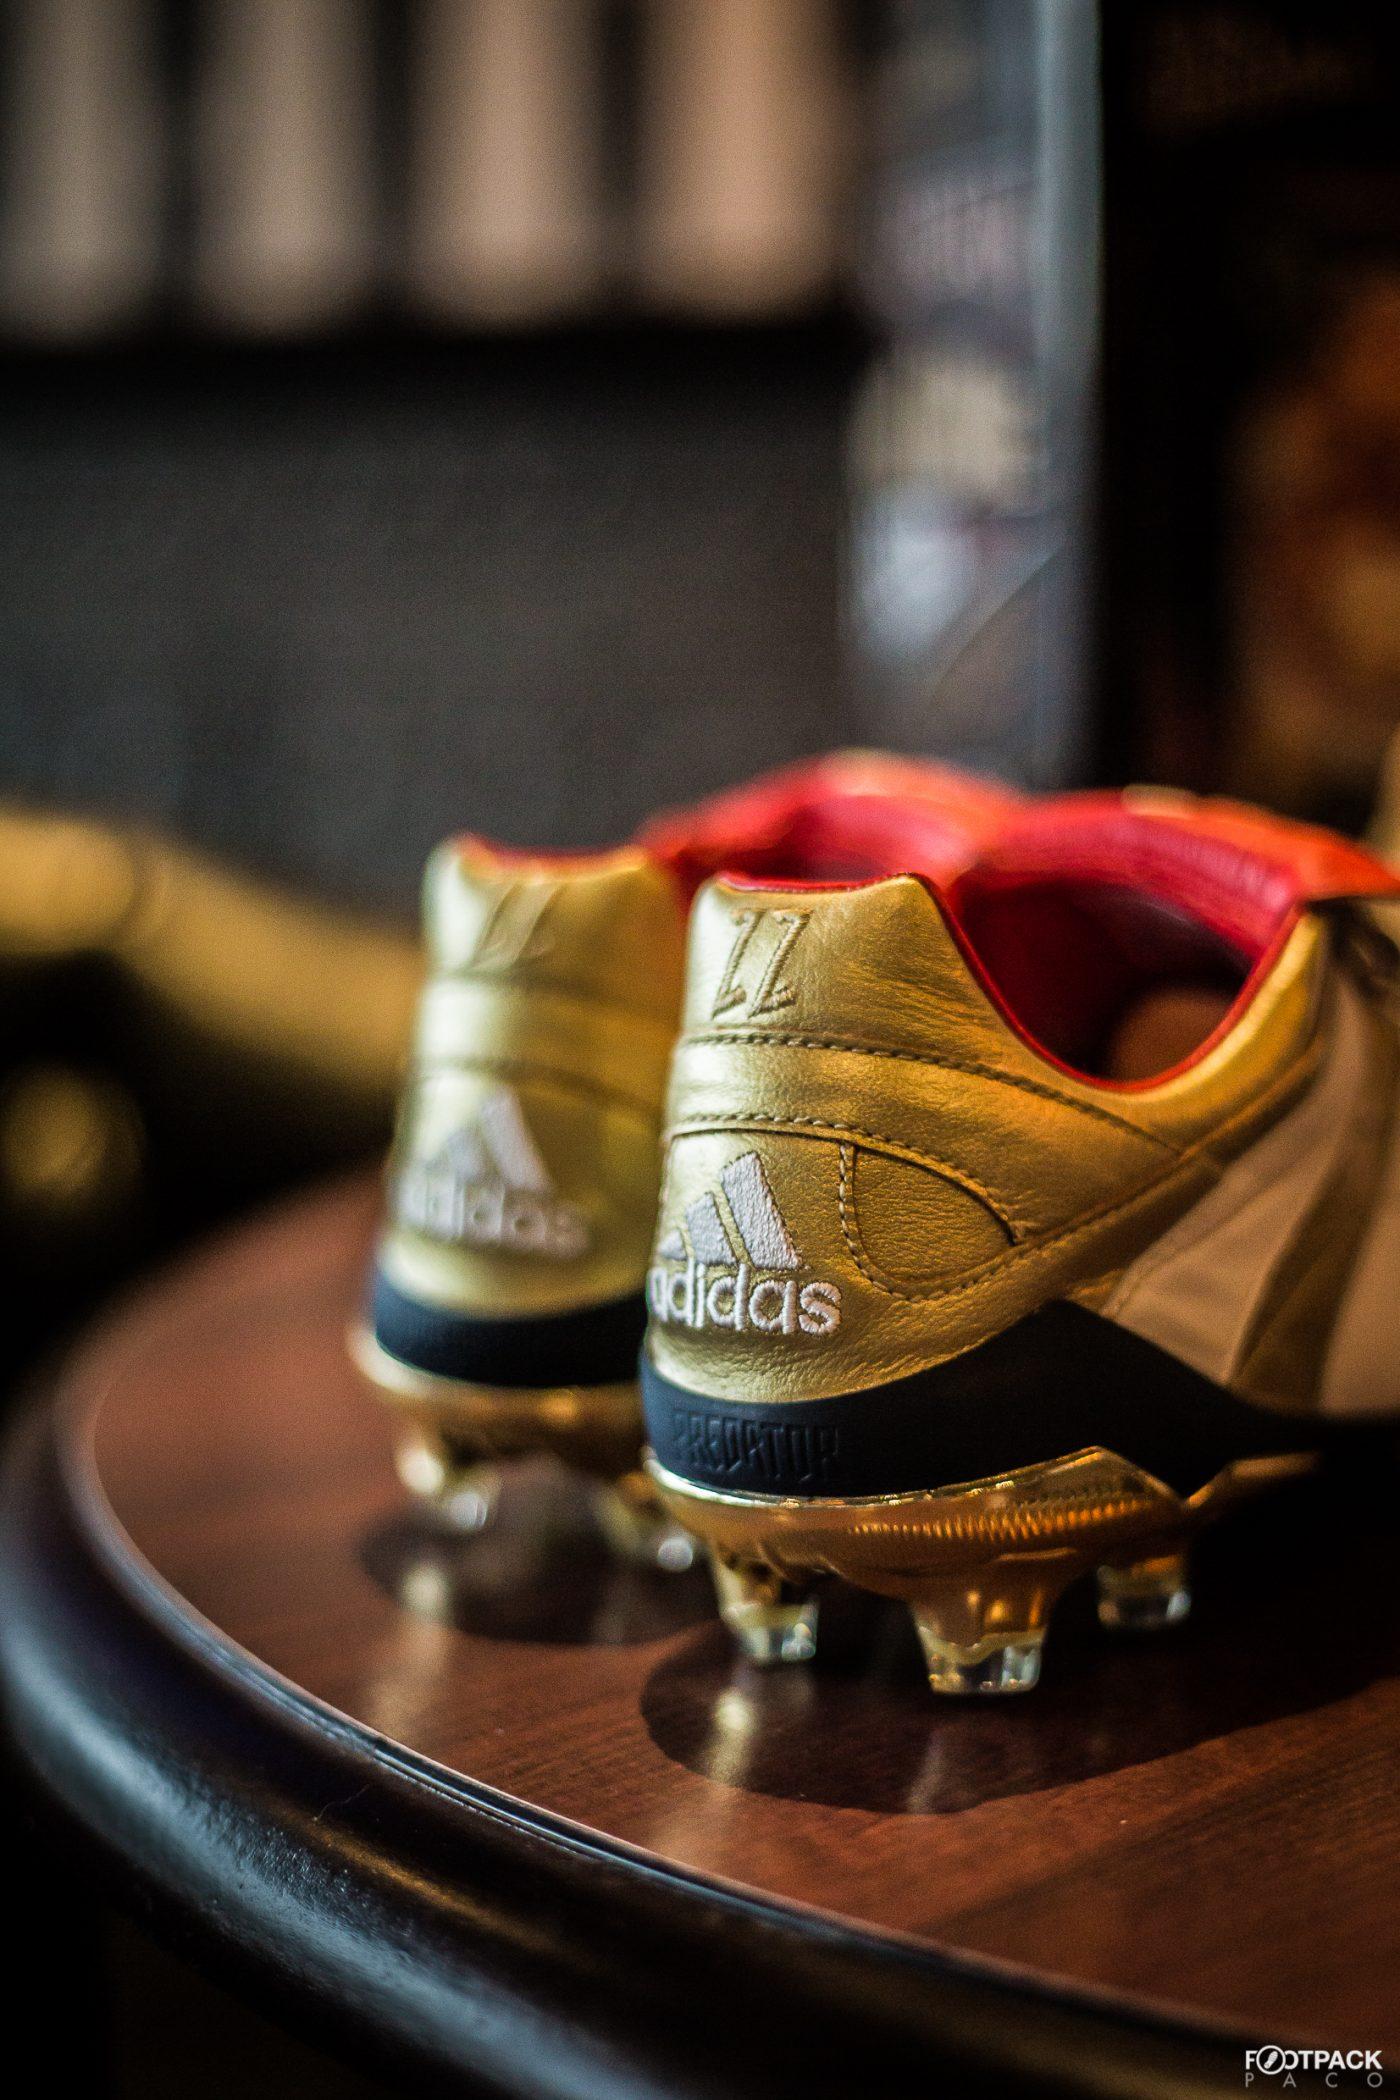 adidas-predator-accelerator-zinedine-zidane-collection-limitee-25-ans-predator-footpack